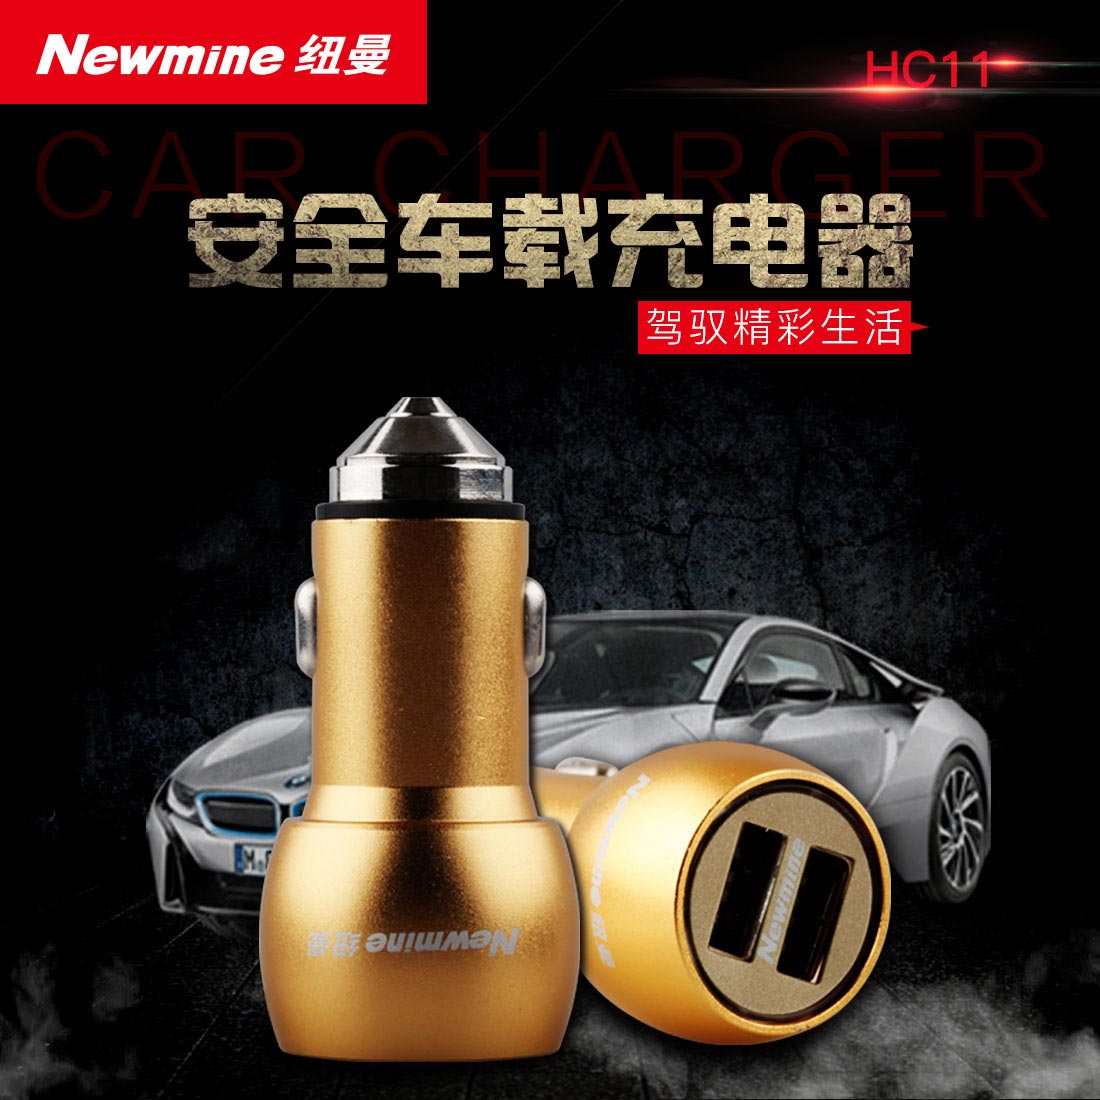 HC11  金属车载充电器